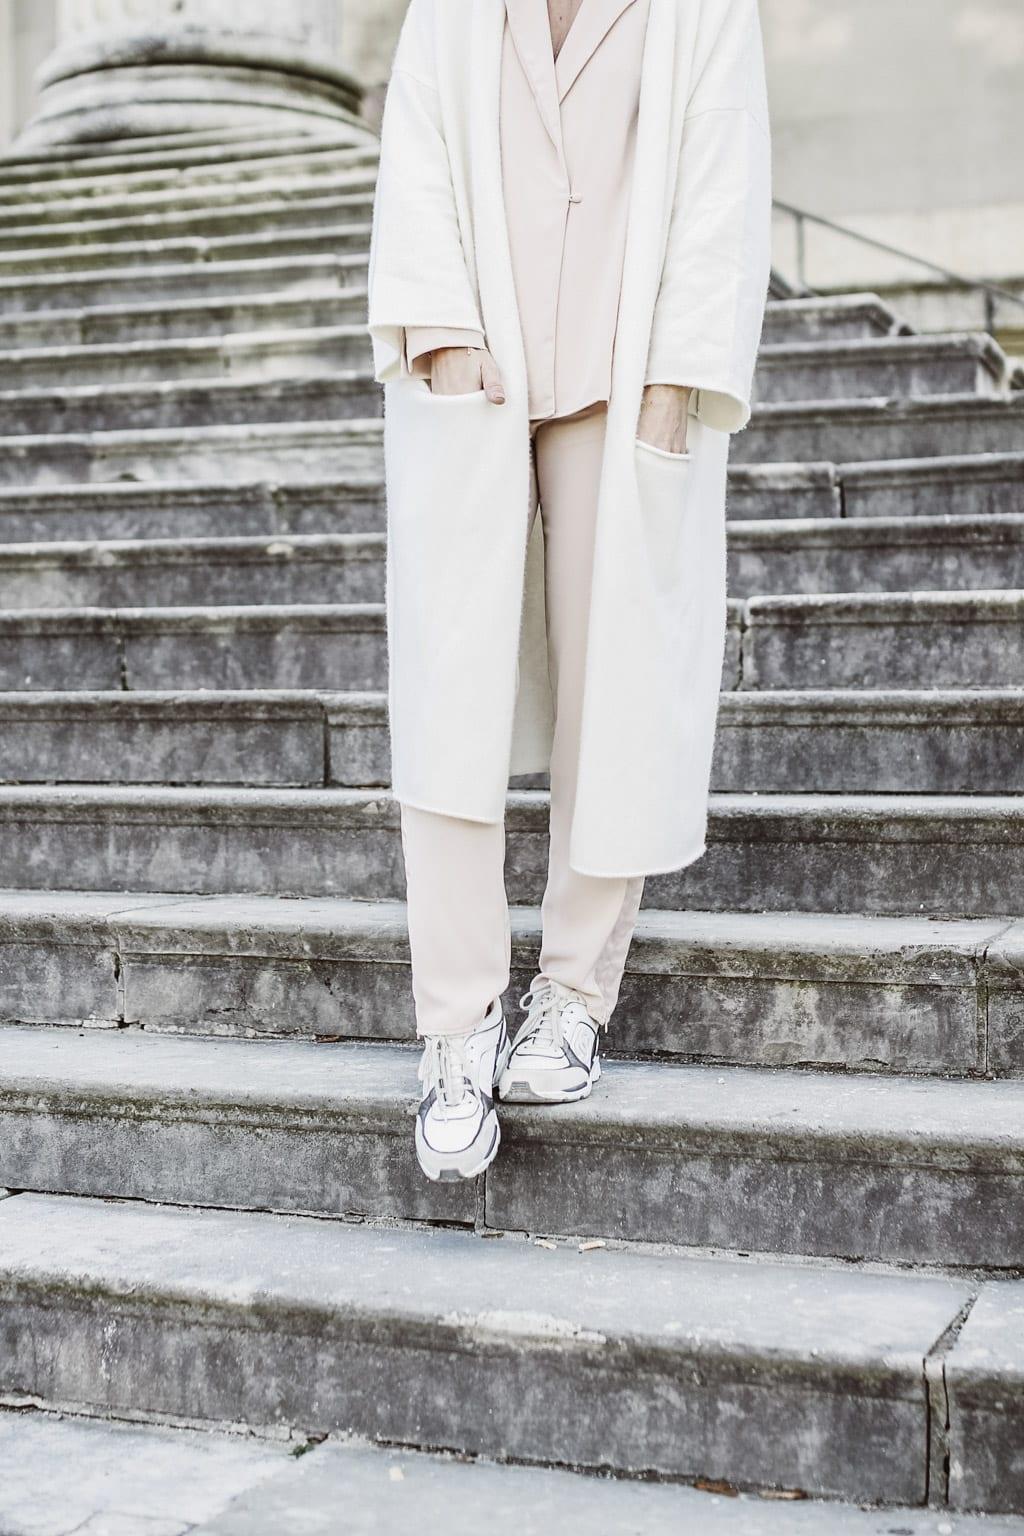 ck-constantlyk-com-pyjama-christmas-winter-outfit-4914